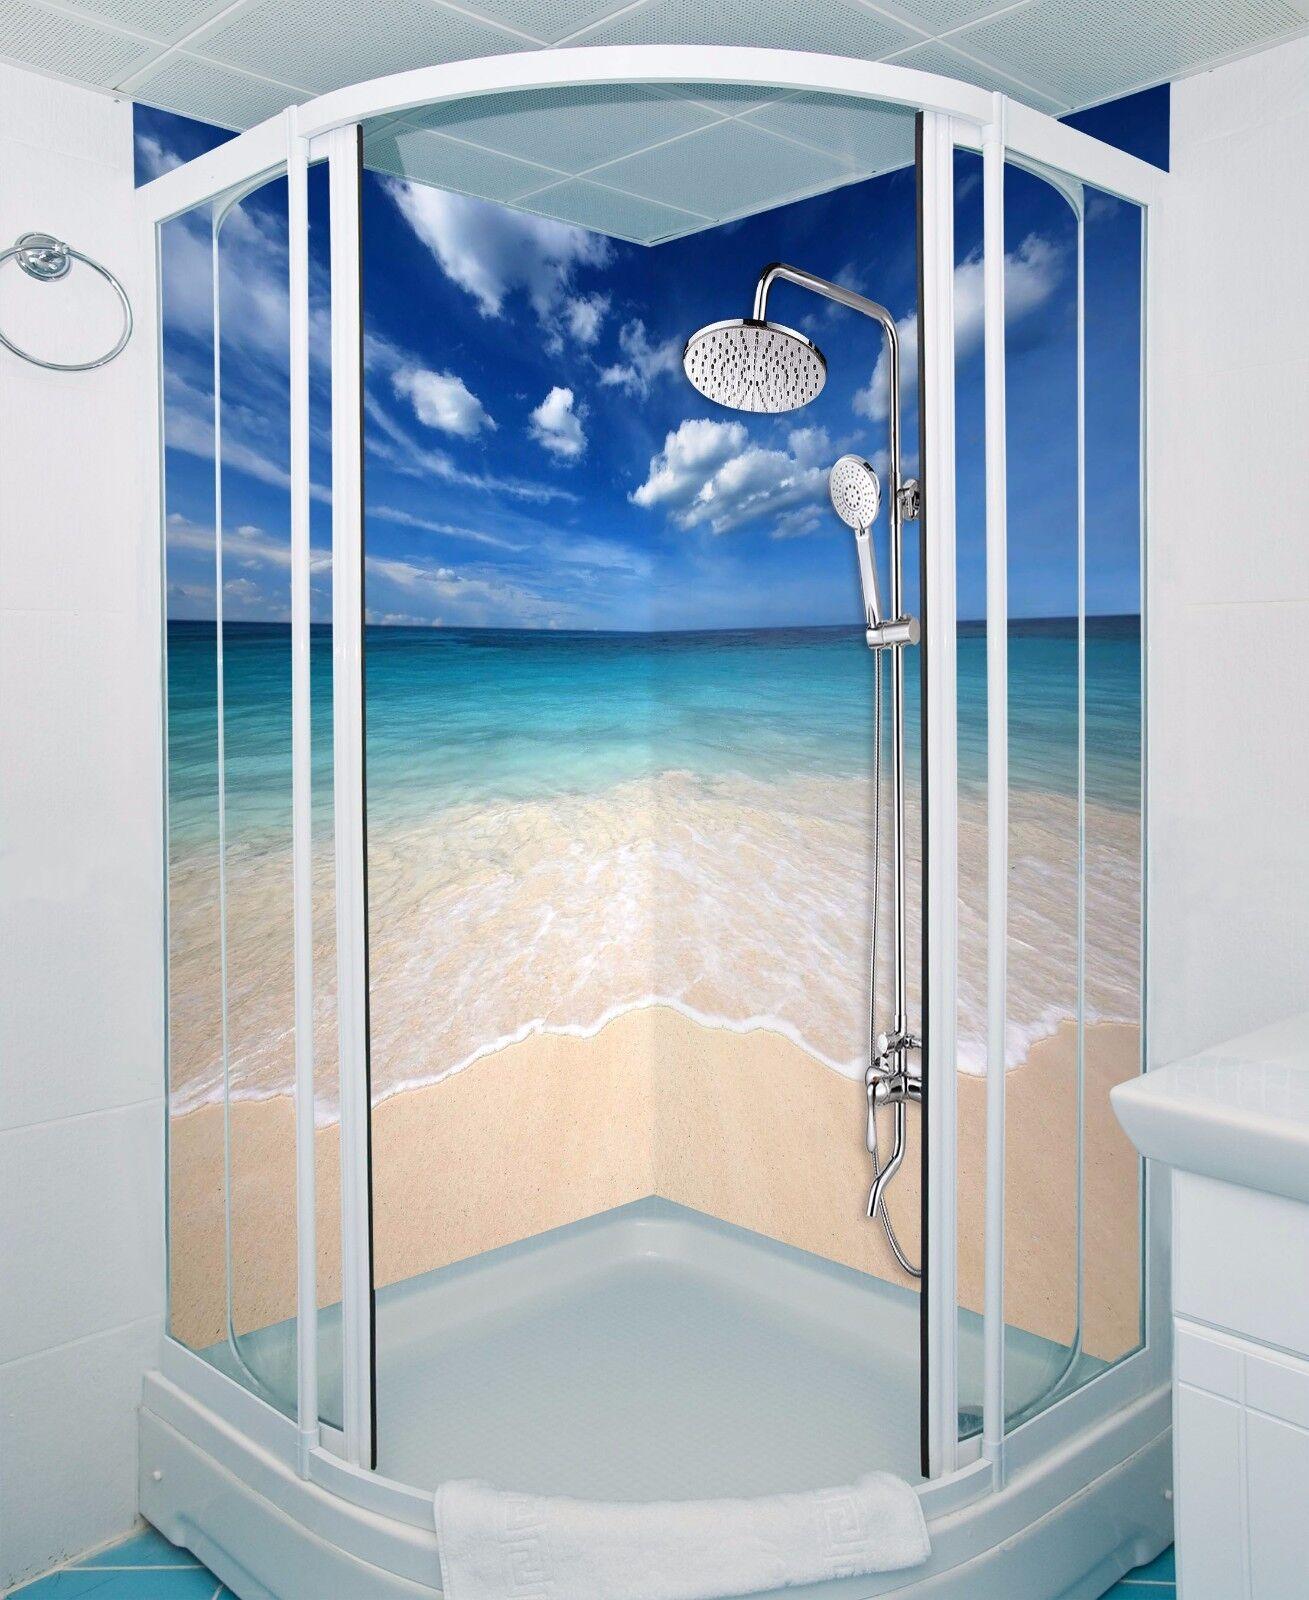 3D bluee sky beach 539 WallPaper Bathroom Print Decal Wall Deco AJ WALLPAPER UK